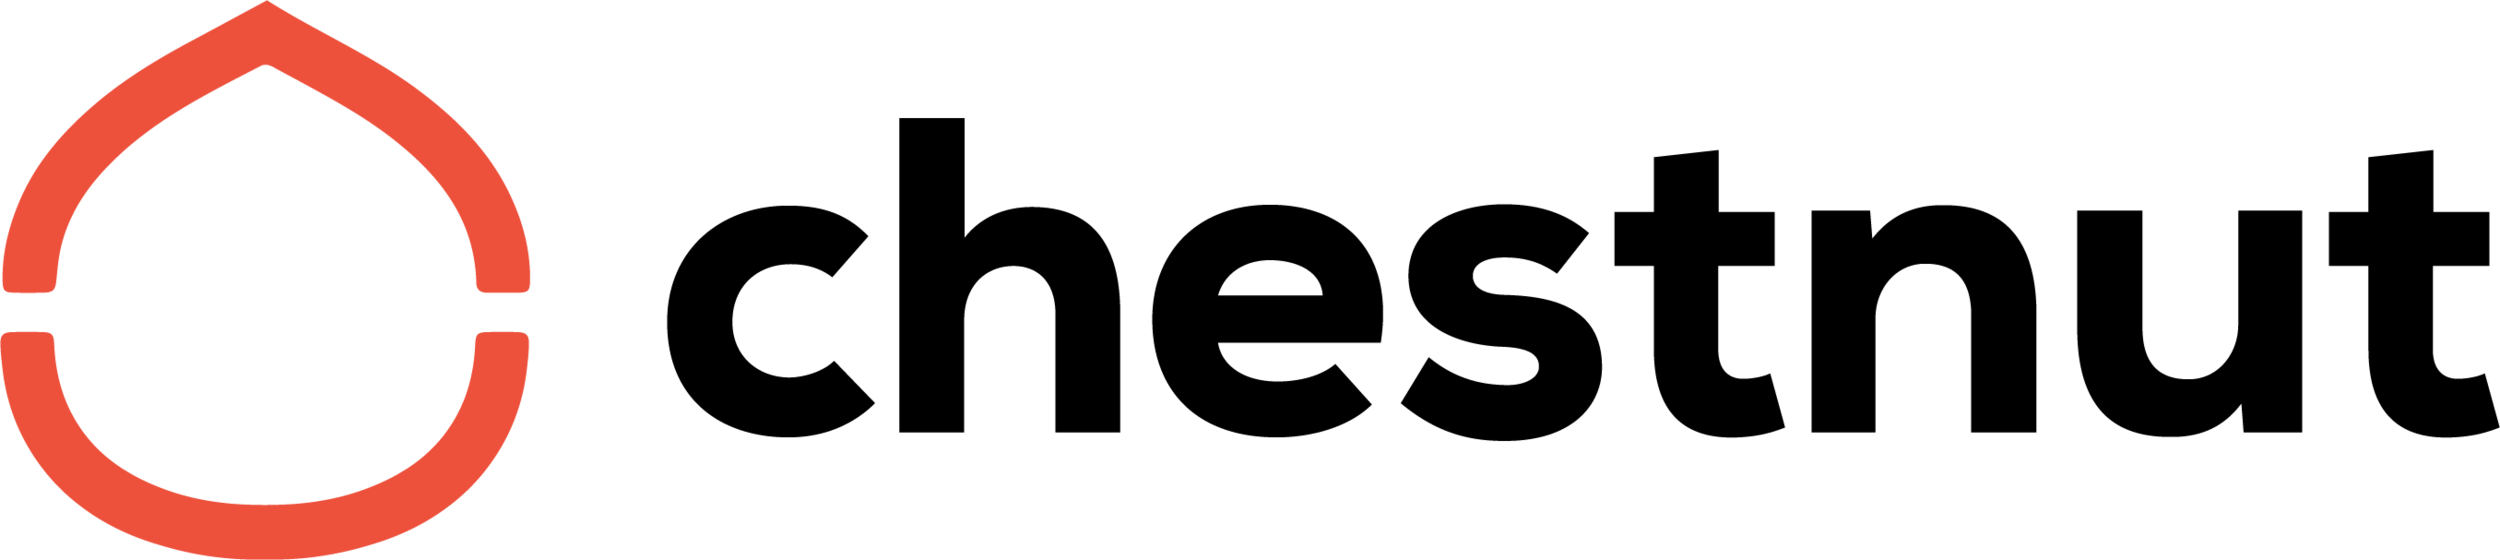 Chestnut_logos_dark-03.png